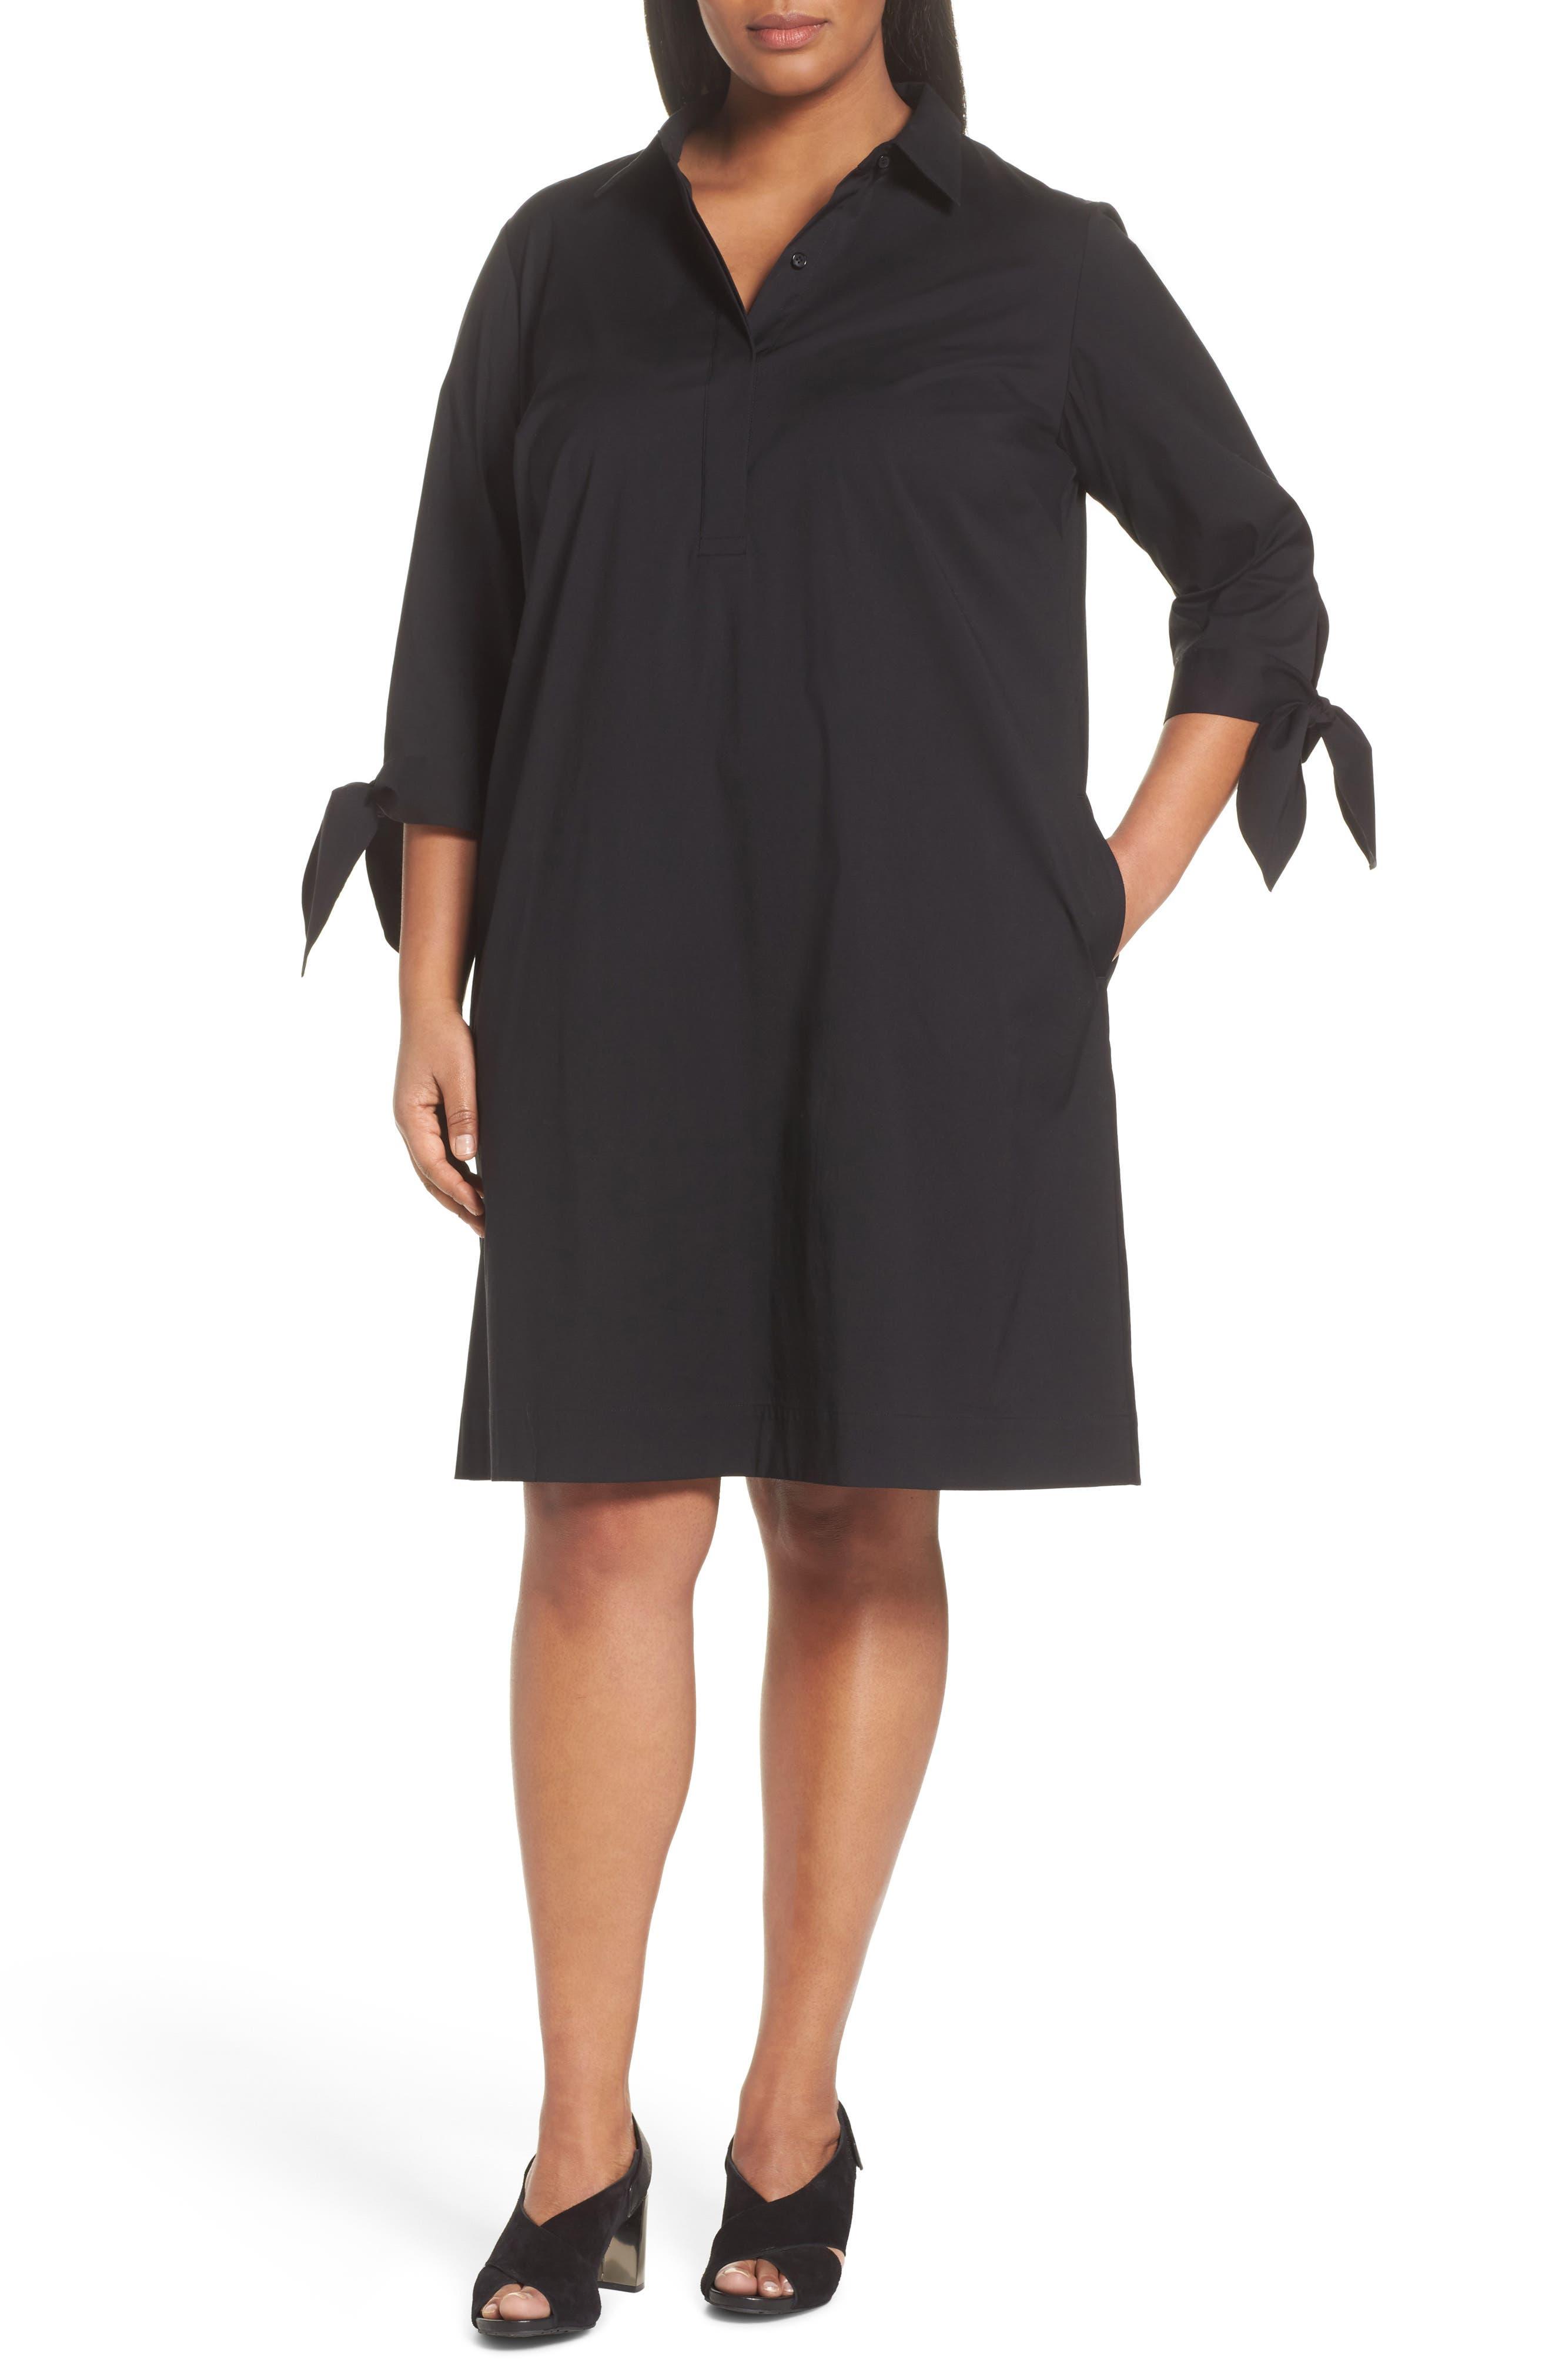 Lafayette 148 Talia Shirtdress,                         Main,                         color, Black